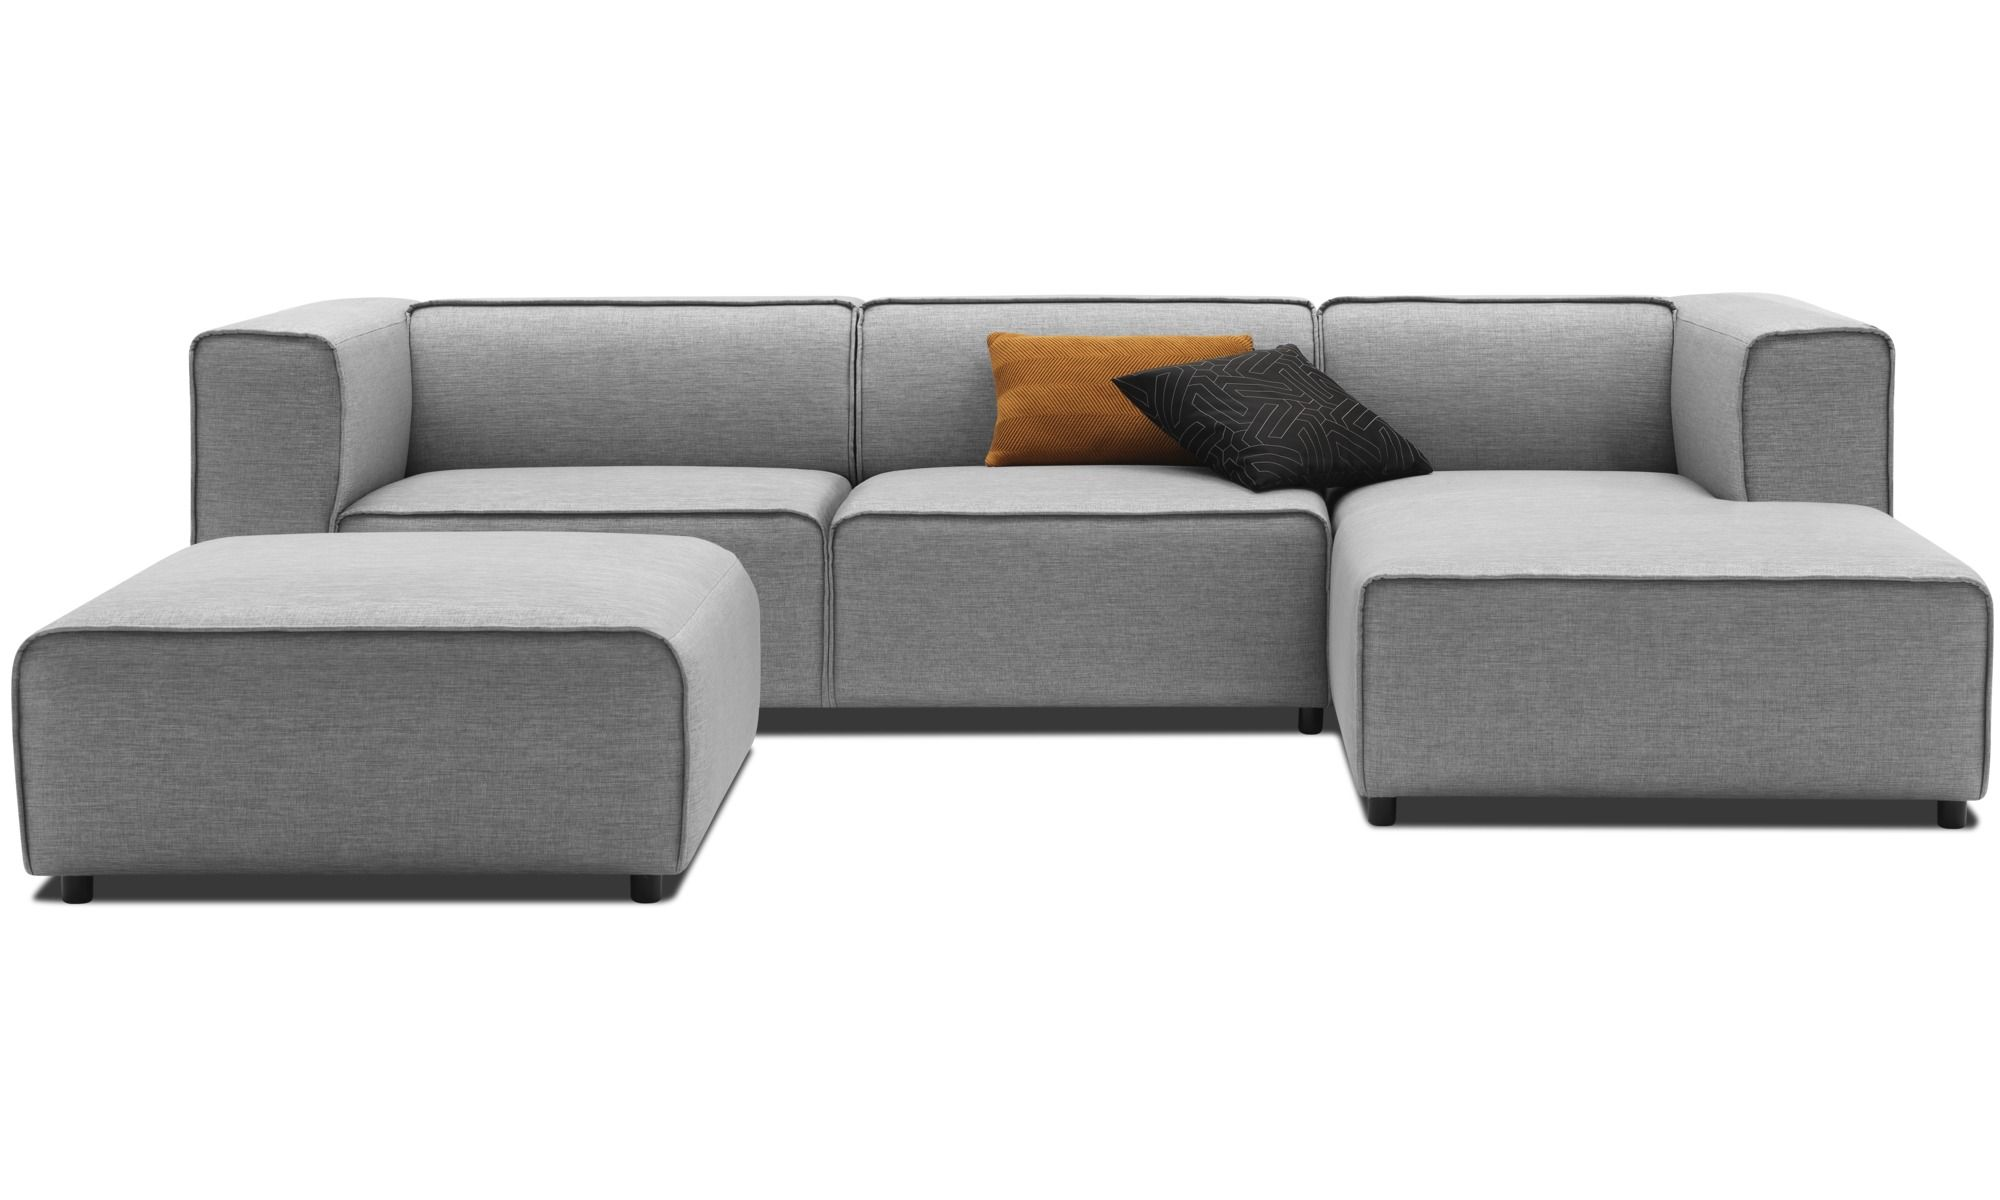 modulare sofas carmo hocker grau stoff einrichtung. Black Bedroom Furniture Sets. Home Design Ideas